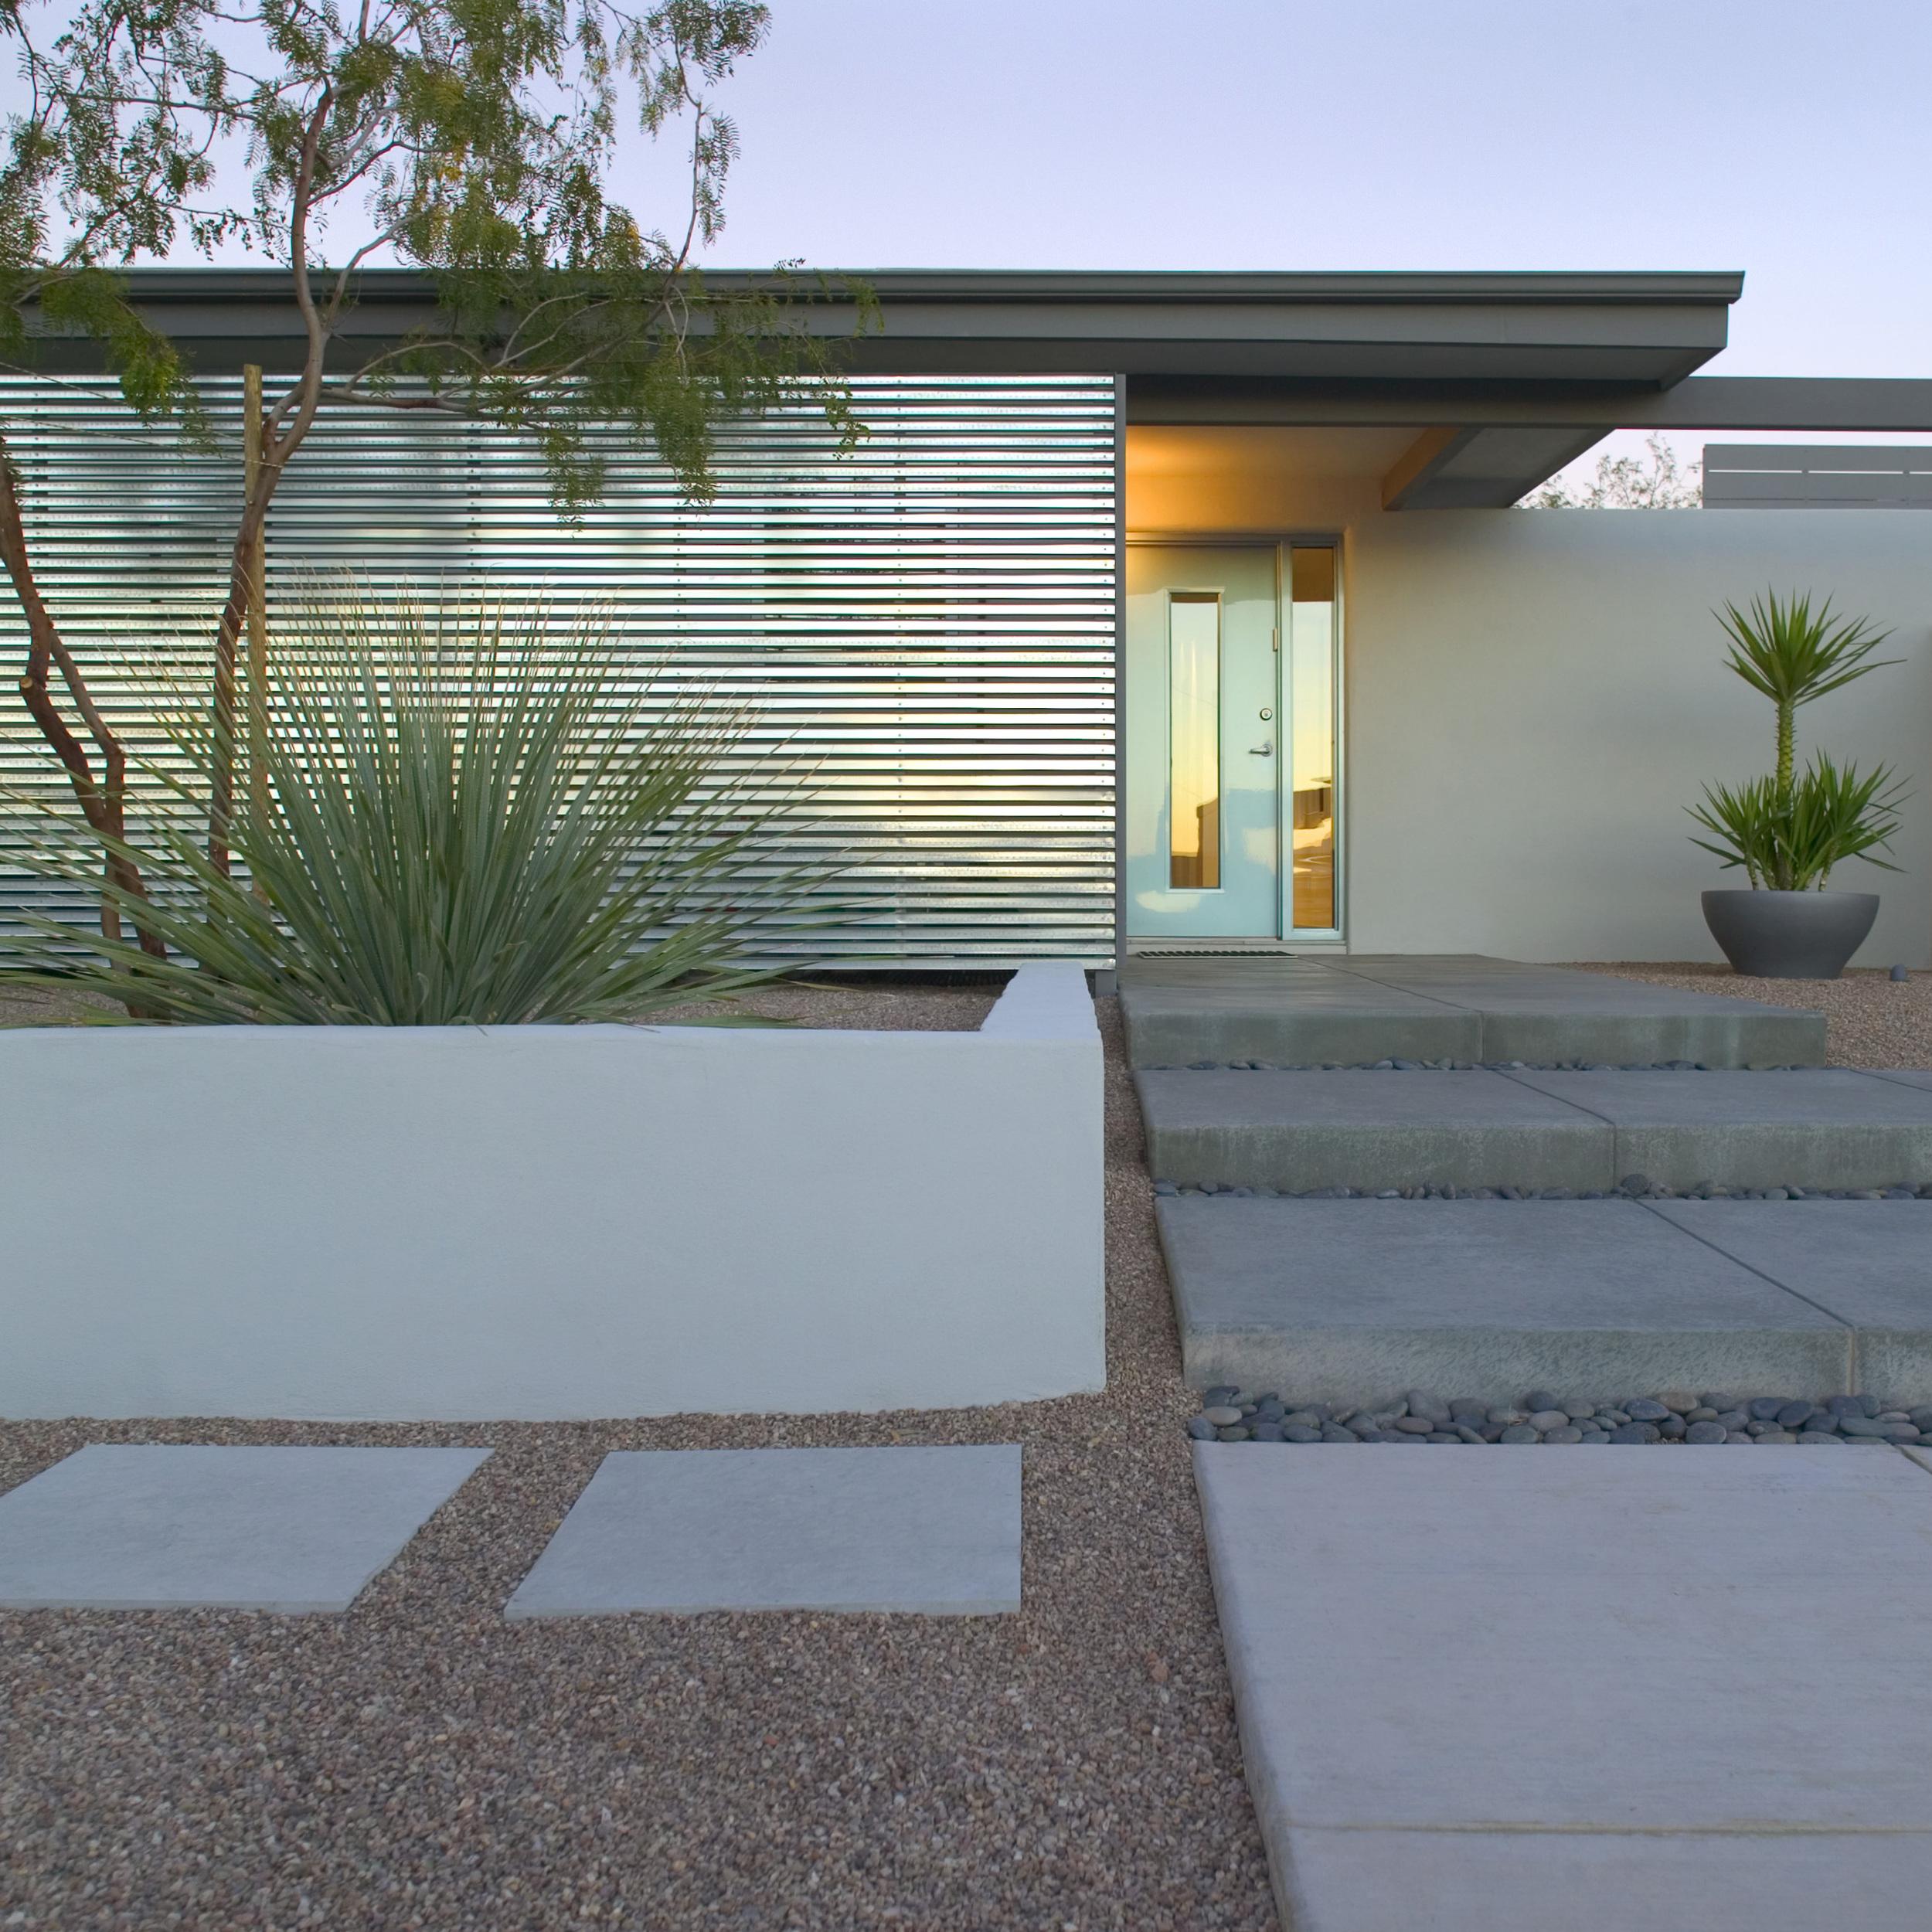 Winter Residence: Tucson, Arizona